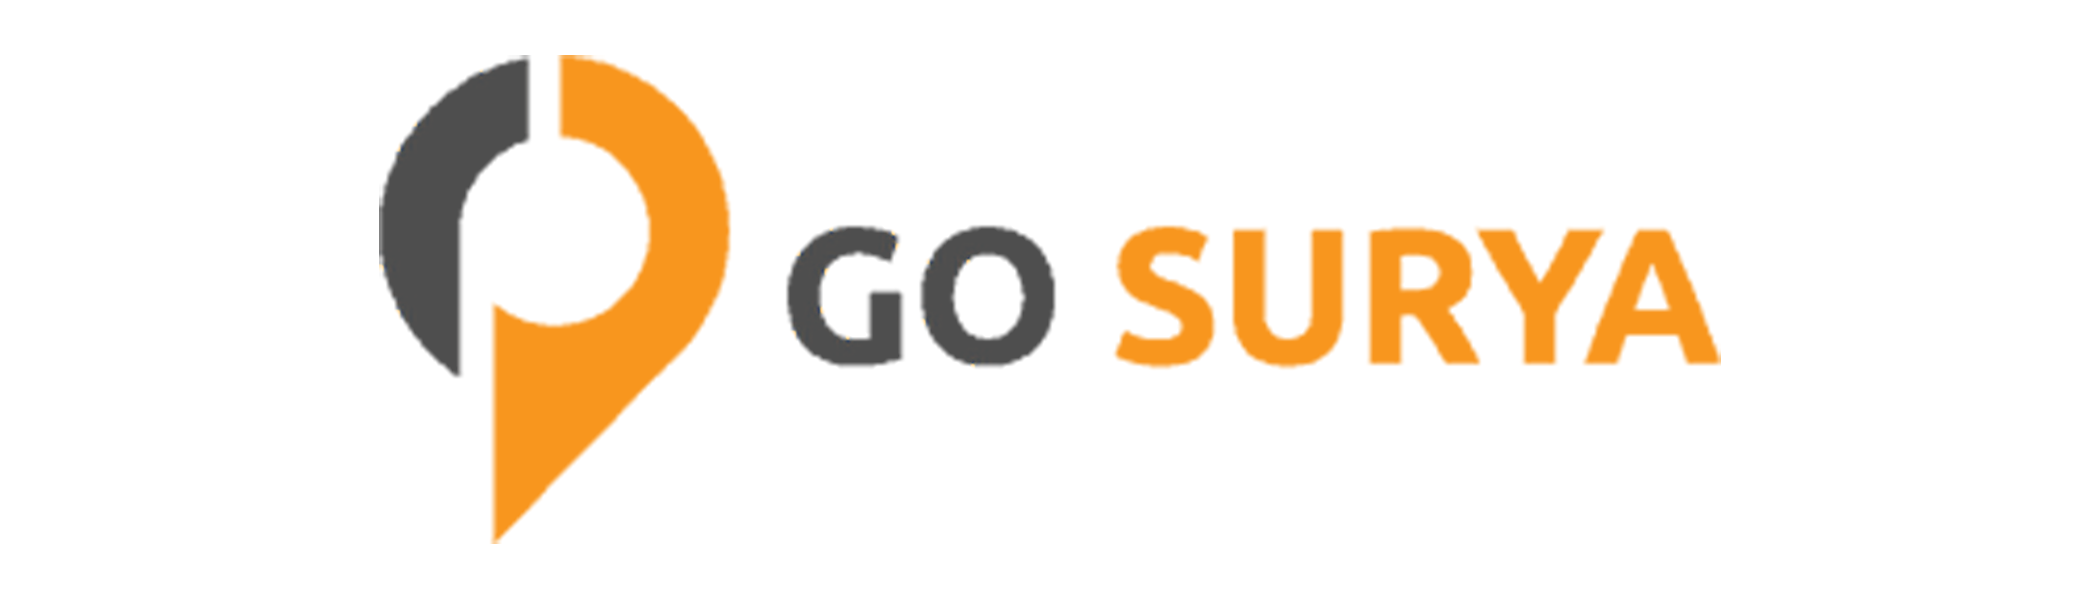 Go Surya